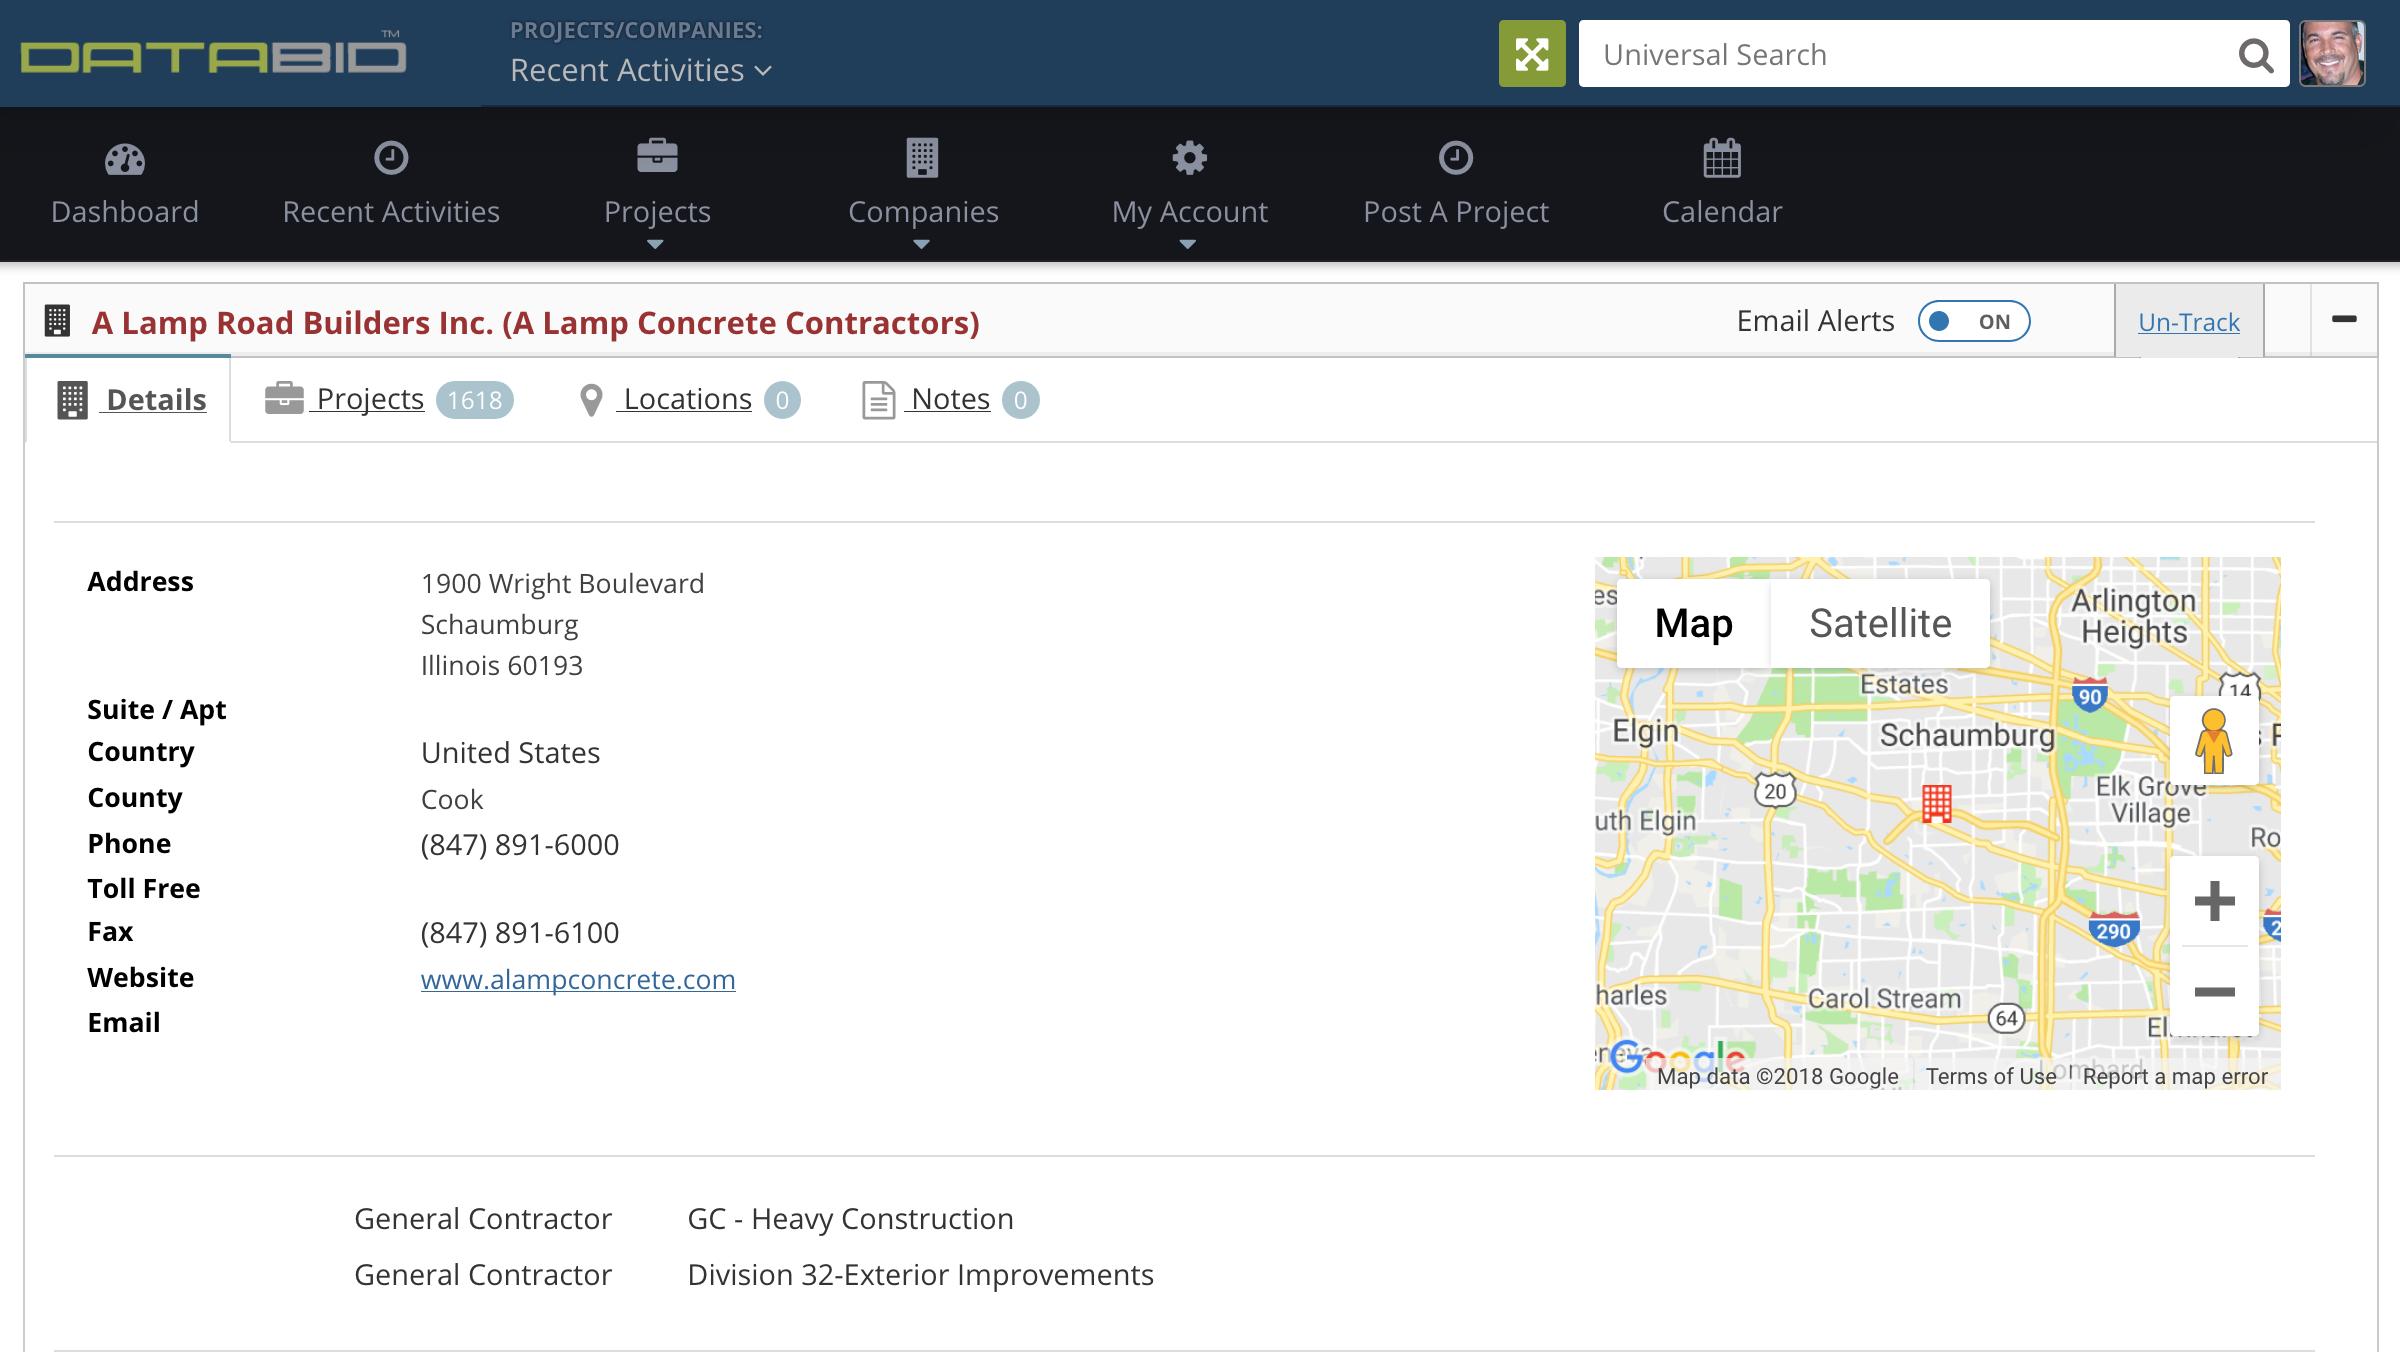 DataBid Company Detail Page